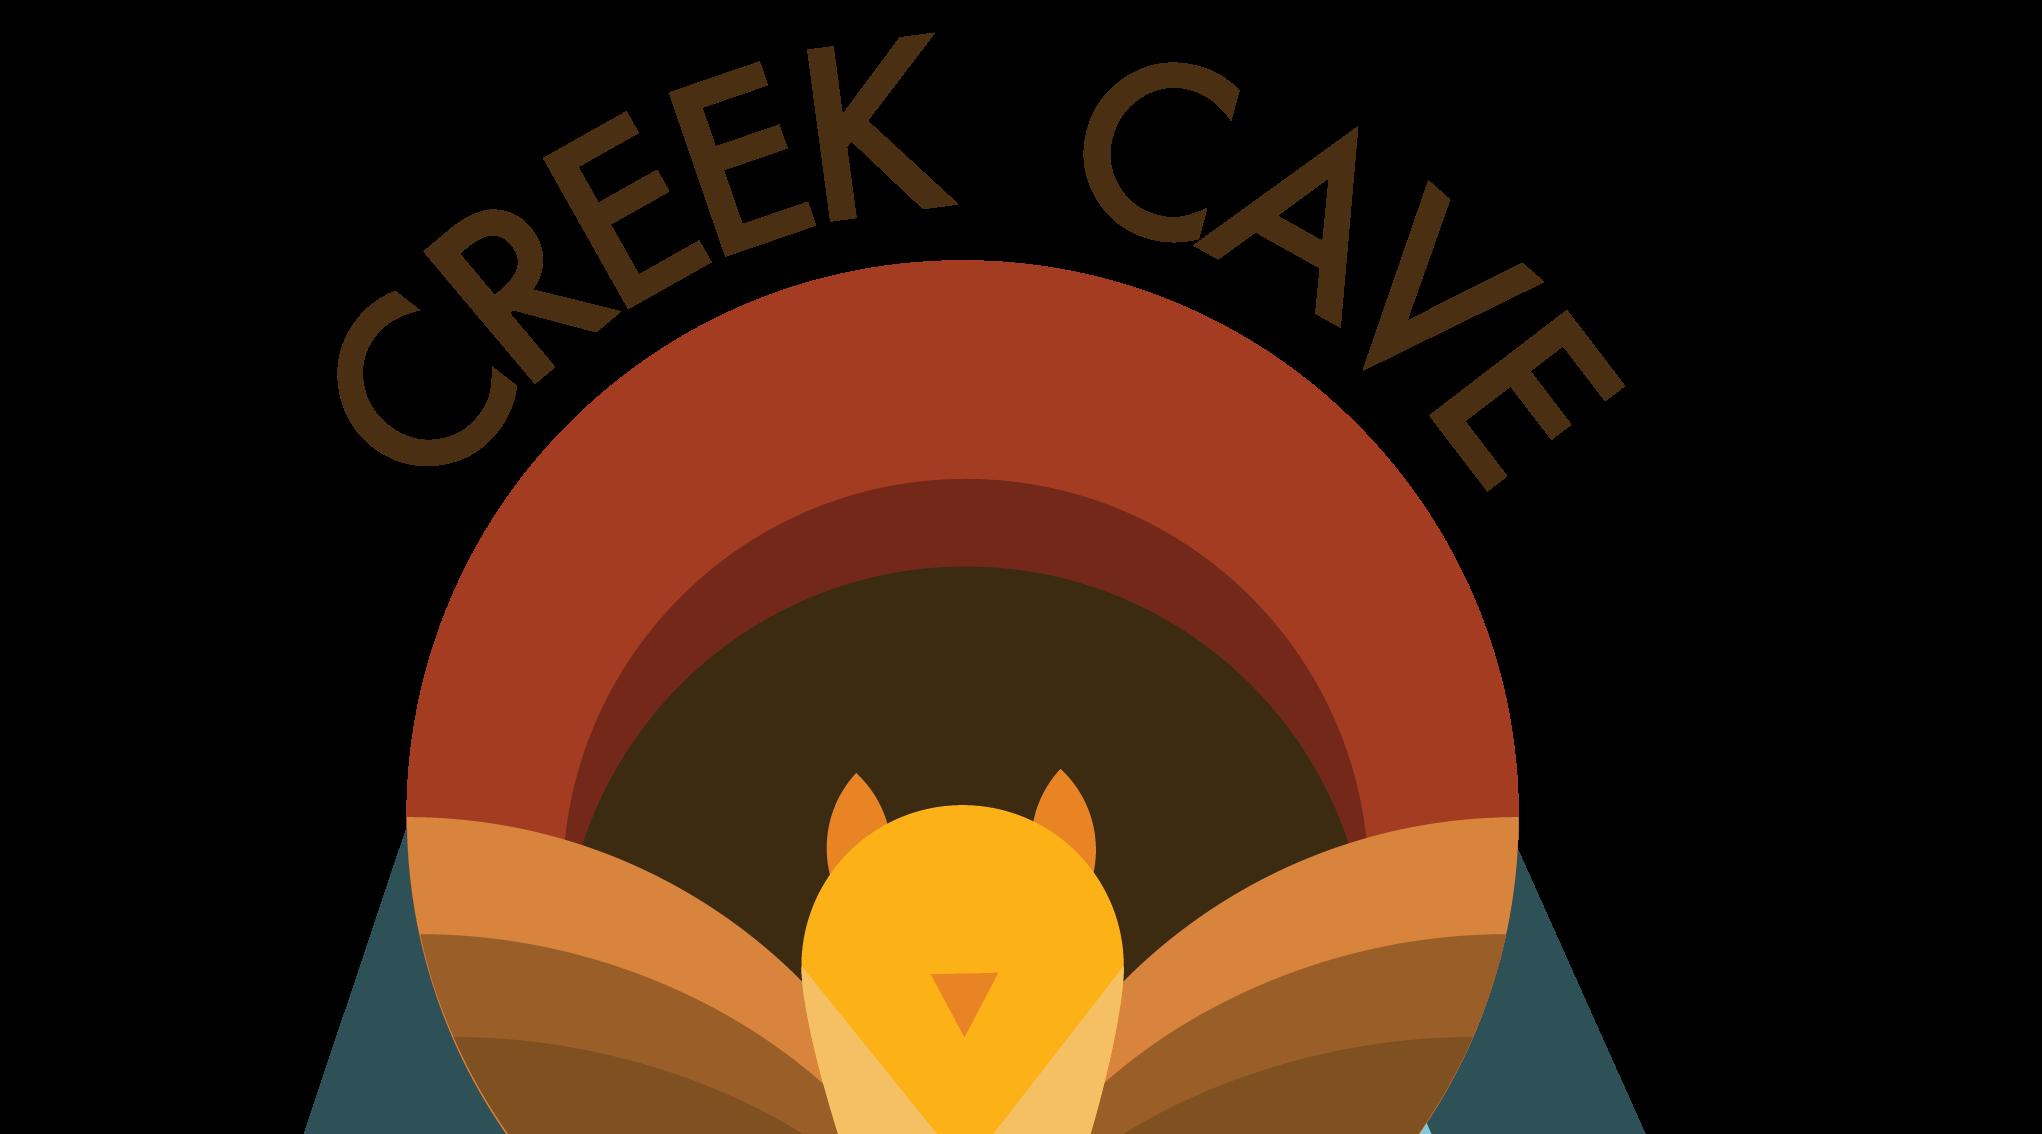 Creek Cave Live